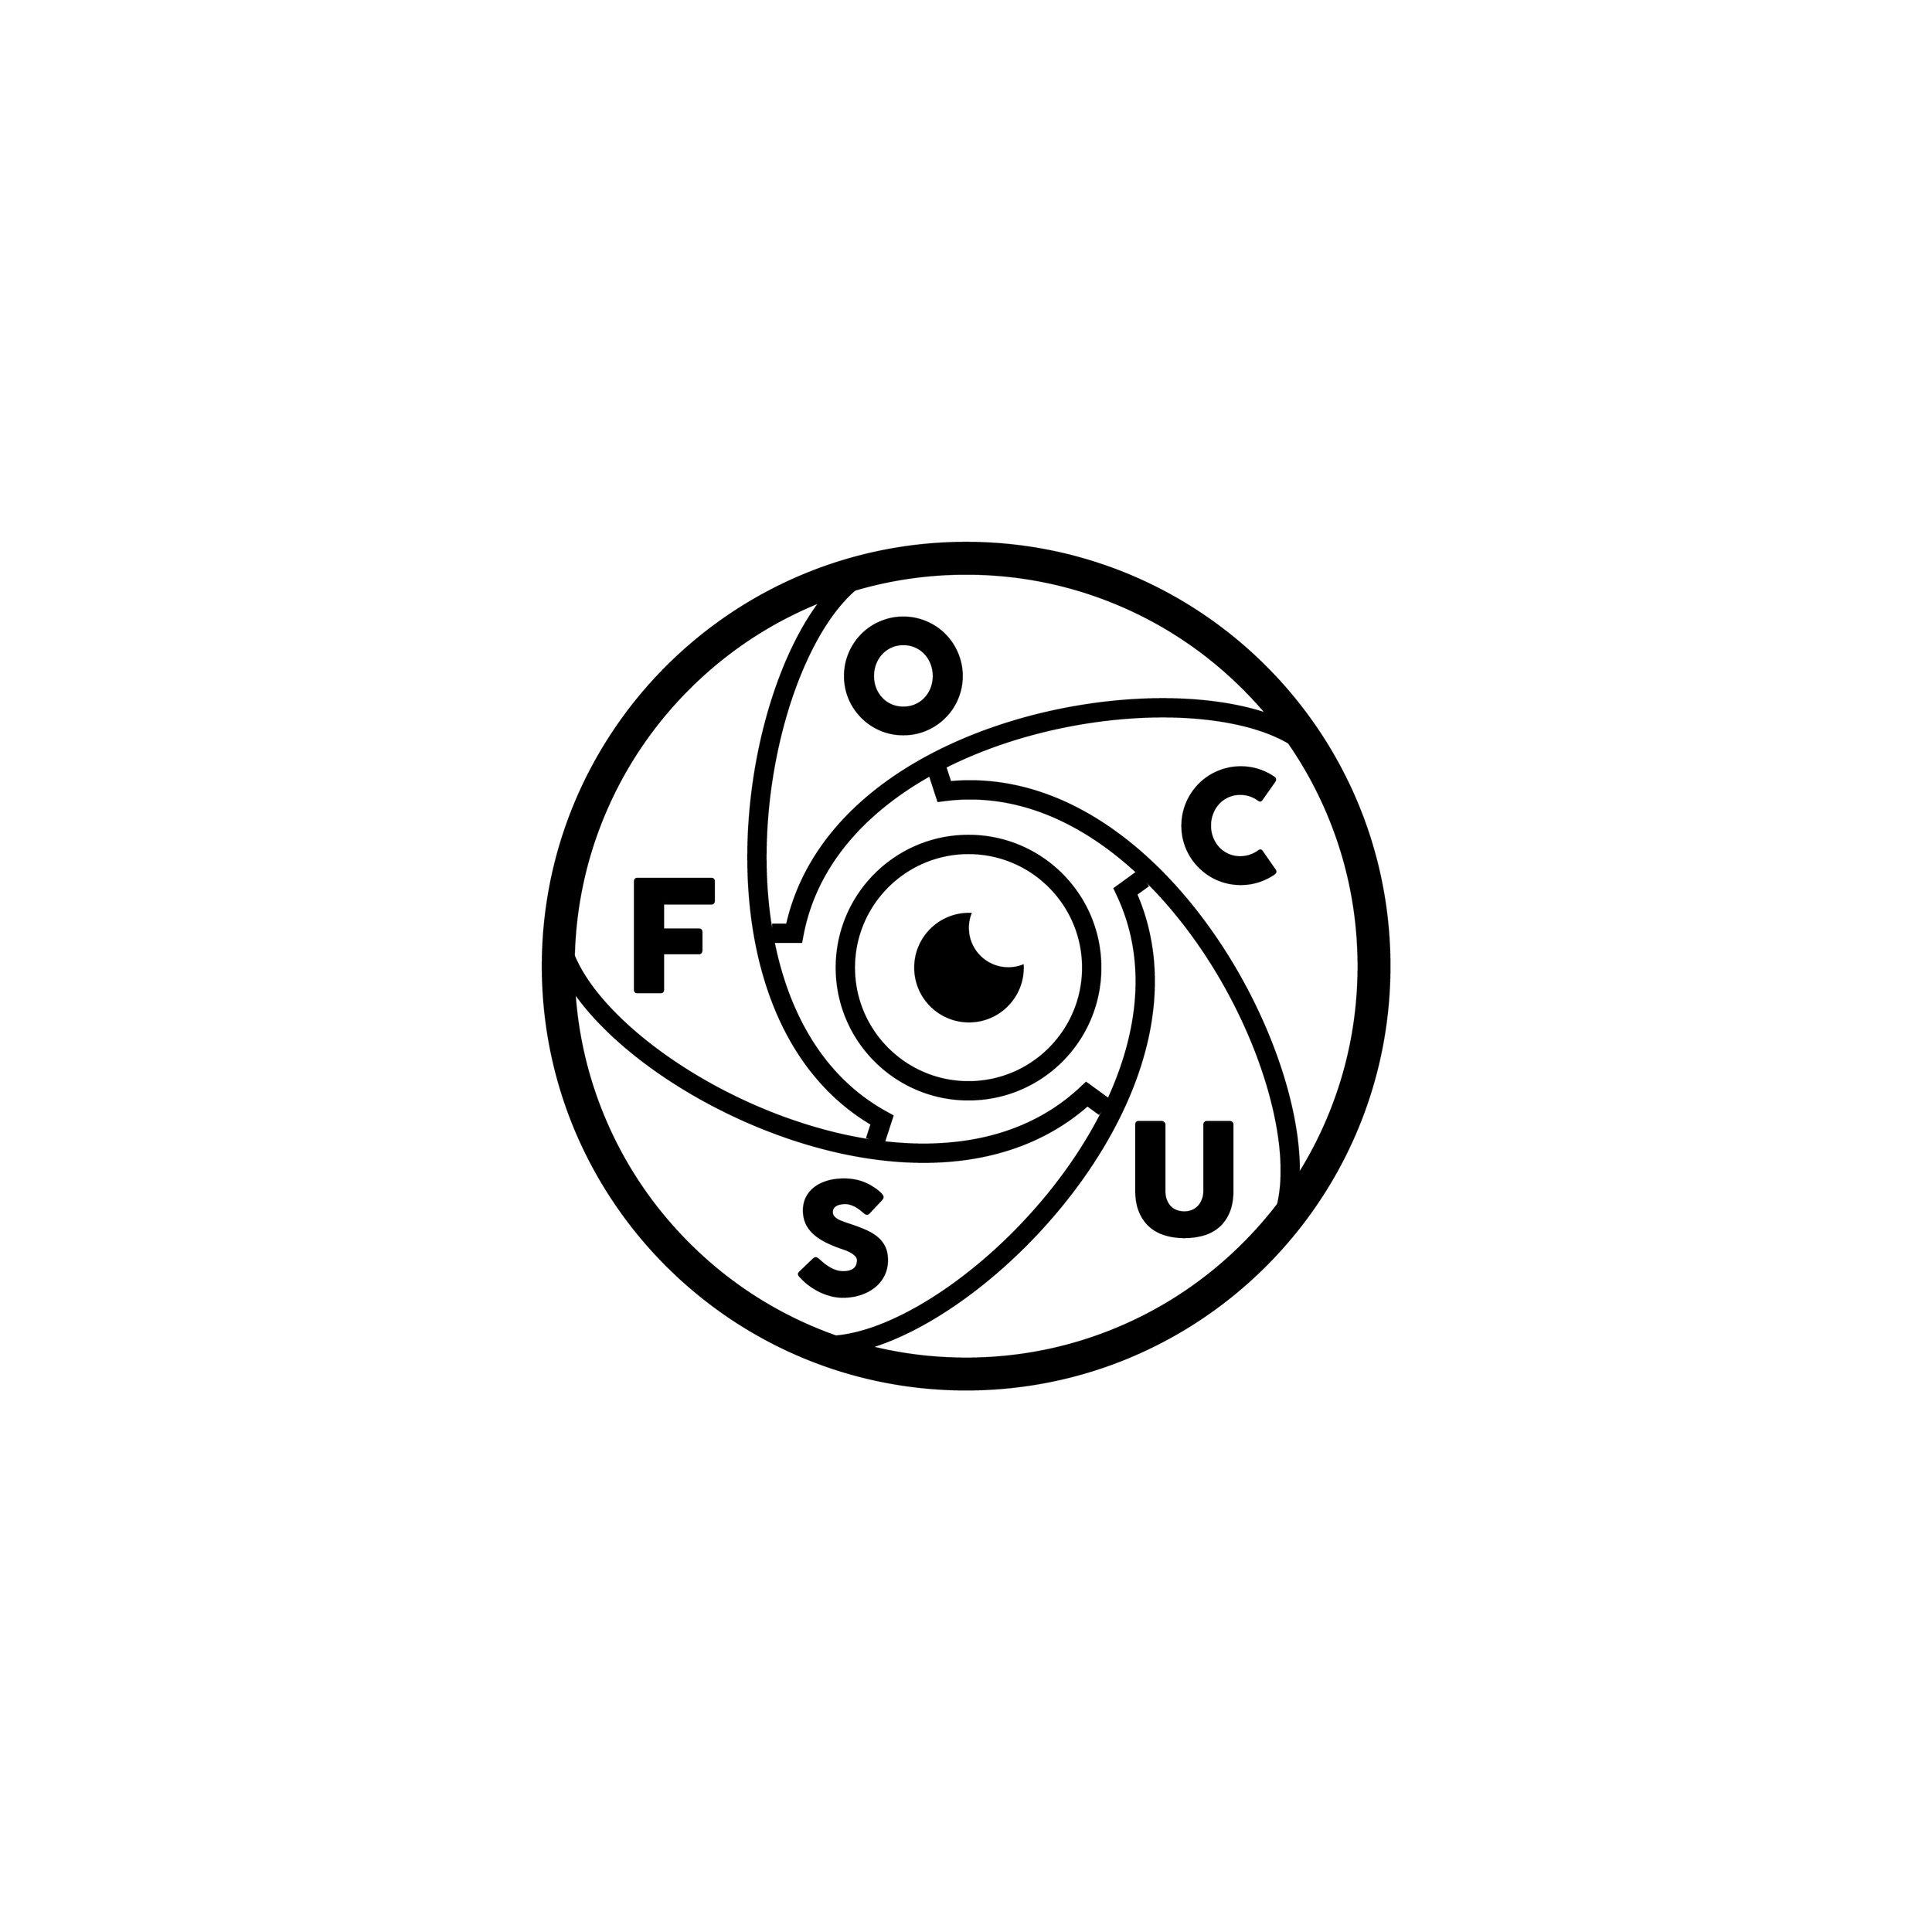 focuseye-08.jpg